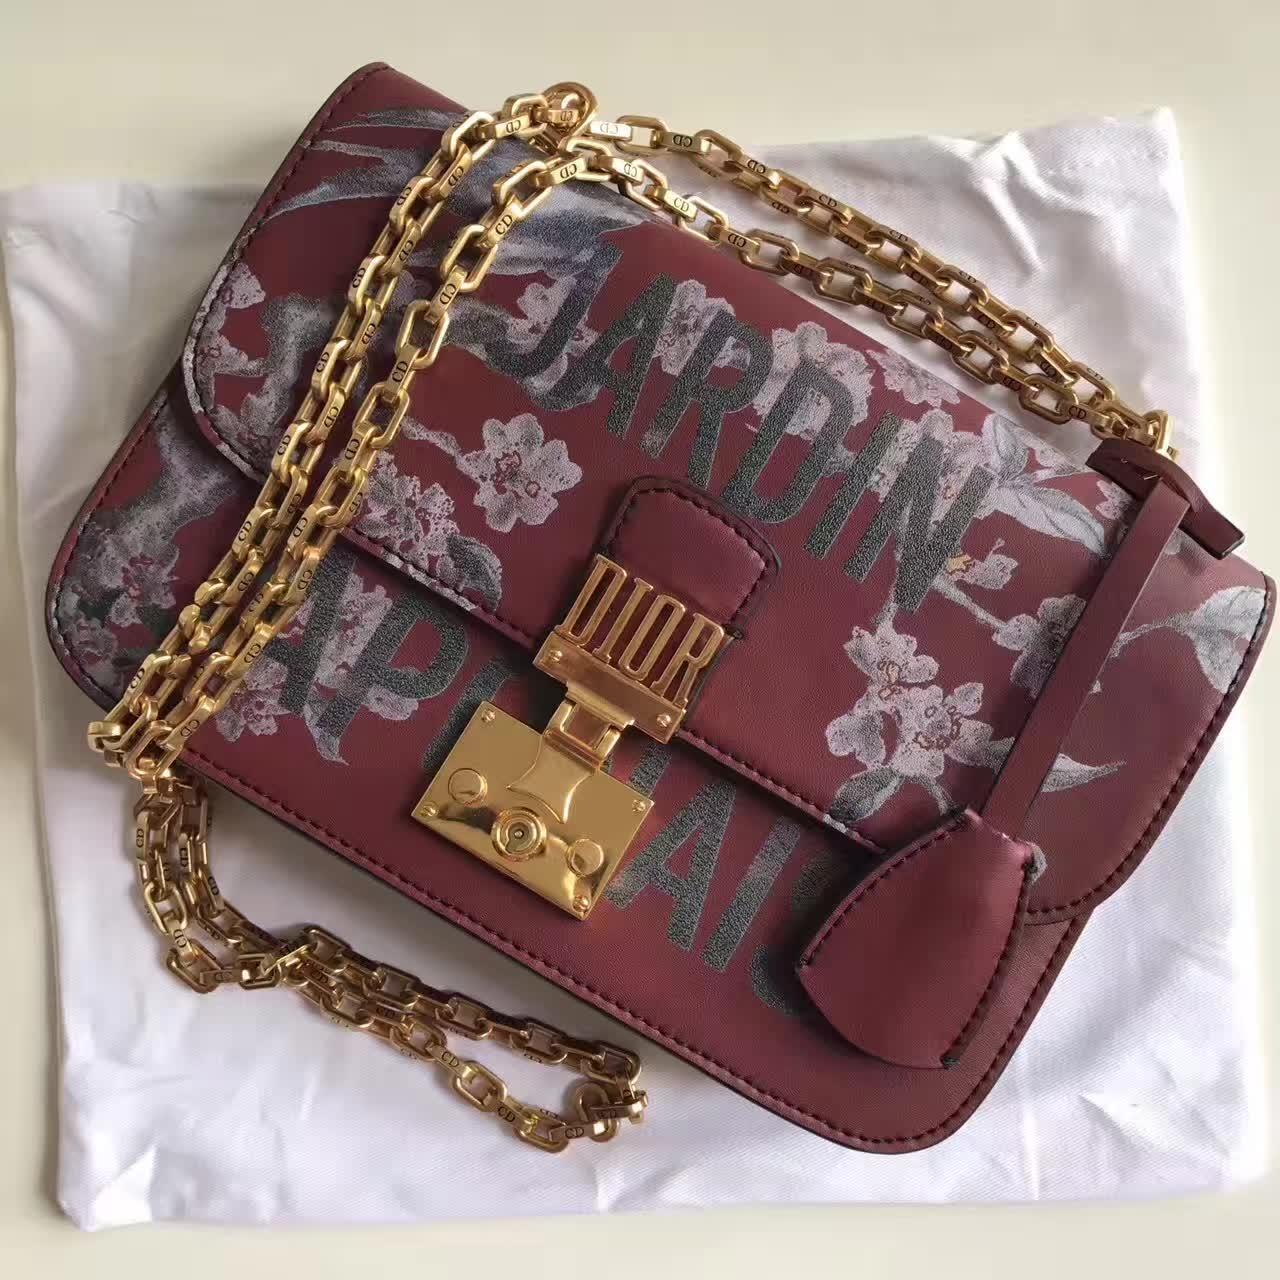 Dior Jardin Japonais Floral Print With Chain Flap Bag Red